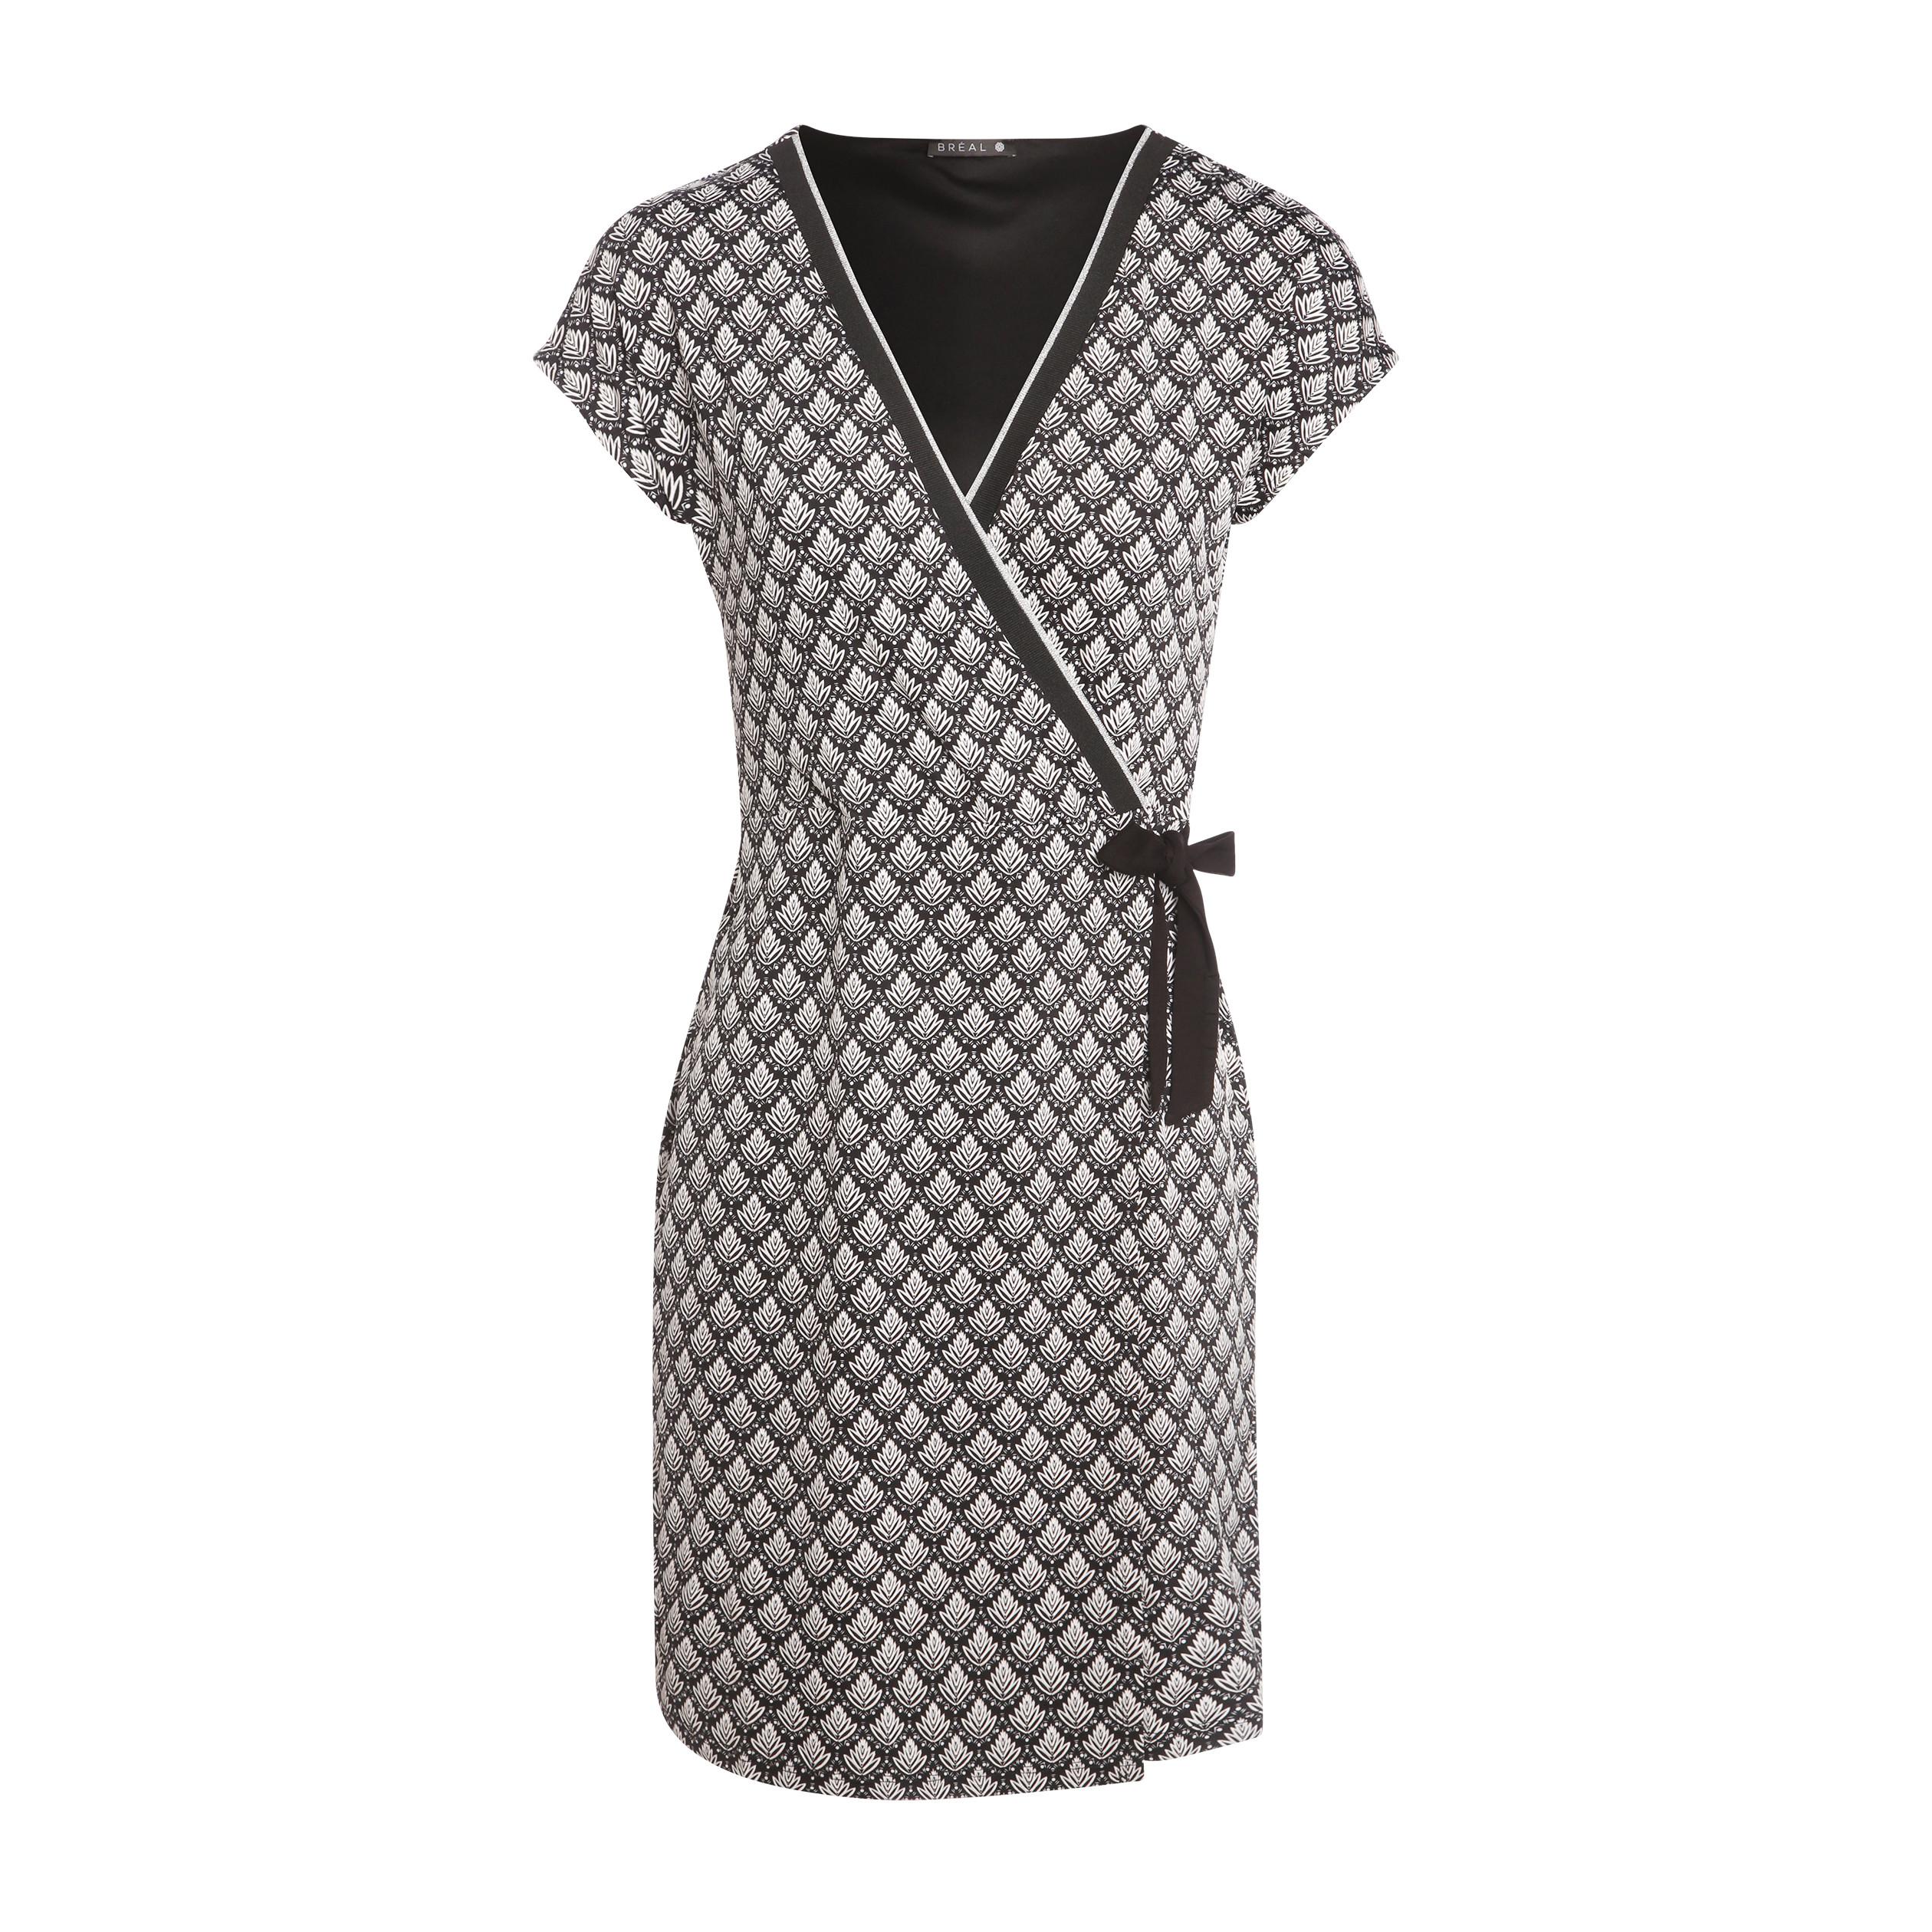 45a4560fd55 Robe courte portefeuille noir femme femme